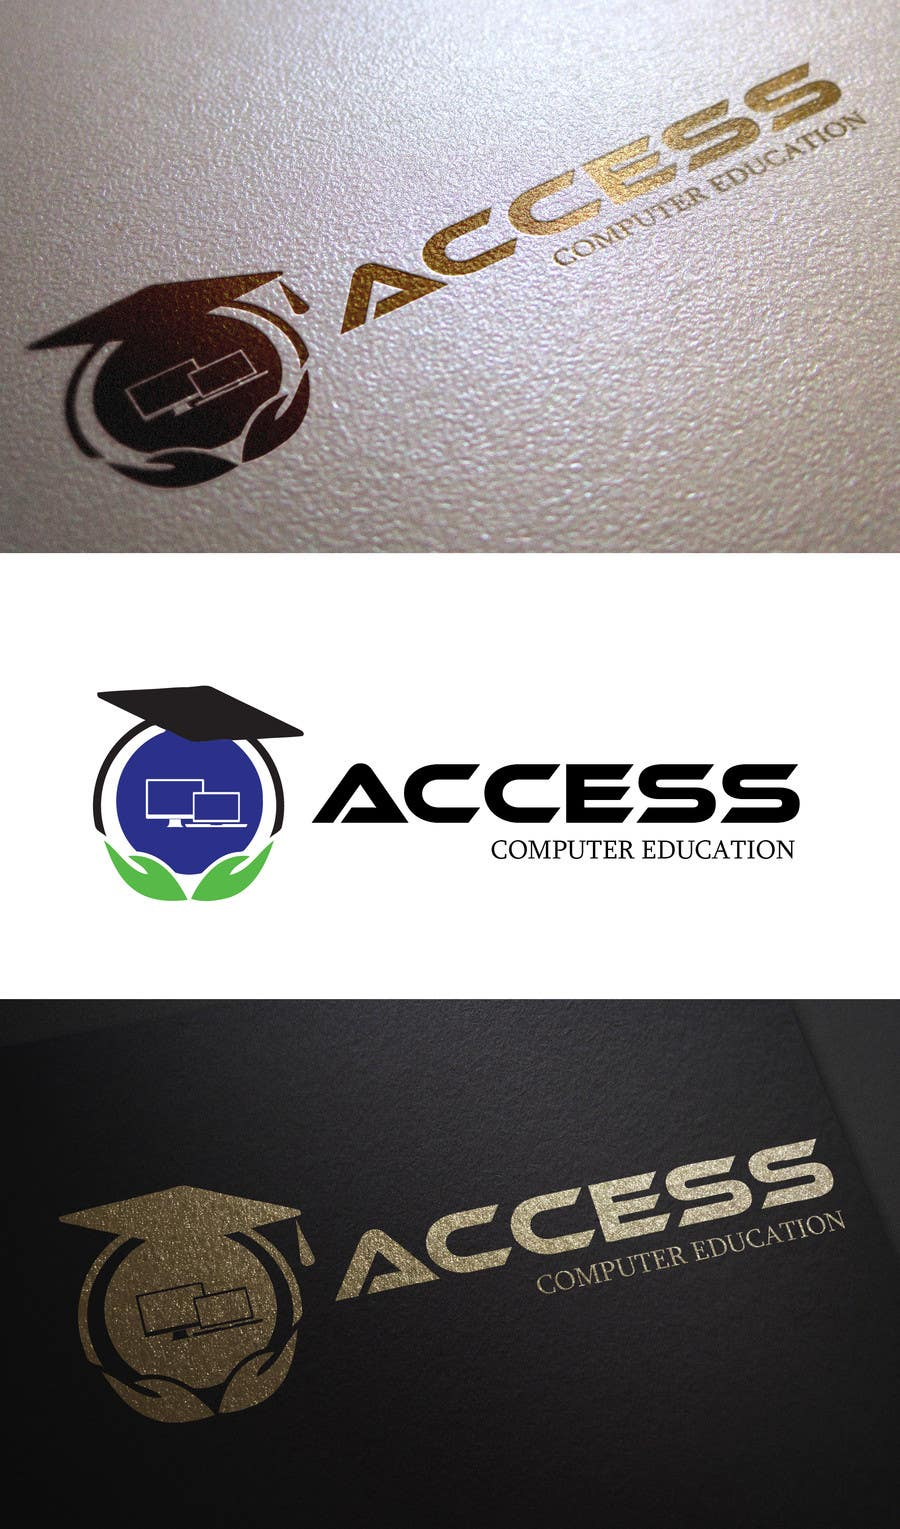 Konkurrenceindlæg #57 for Design a Logo for Access Computer Education